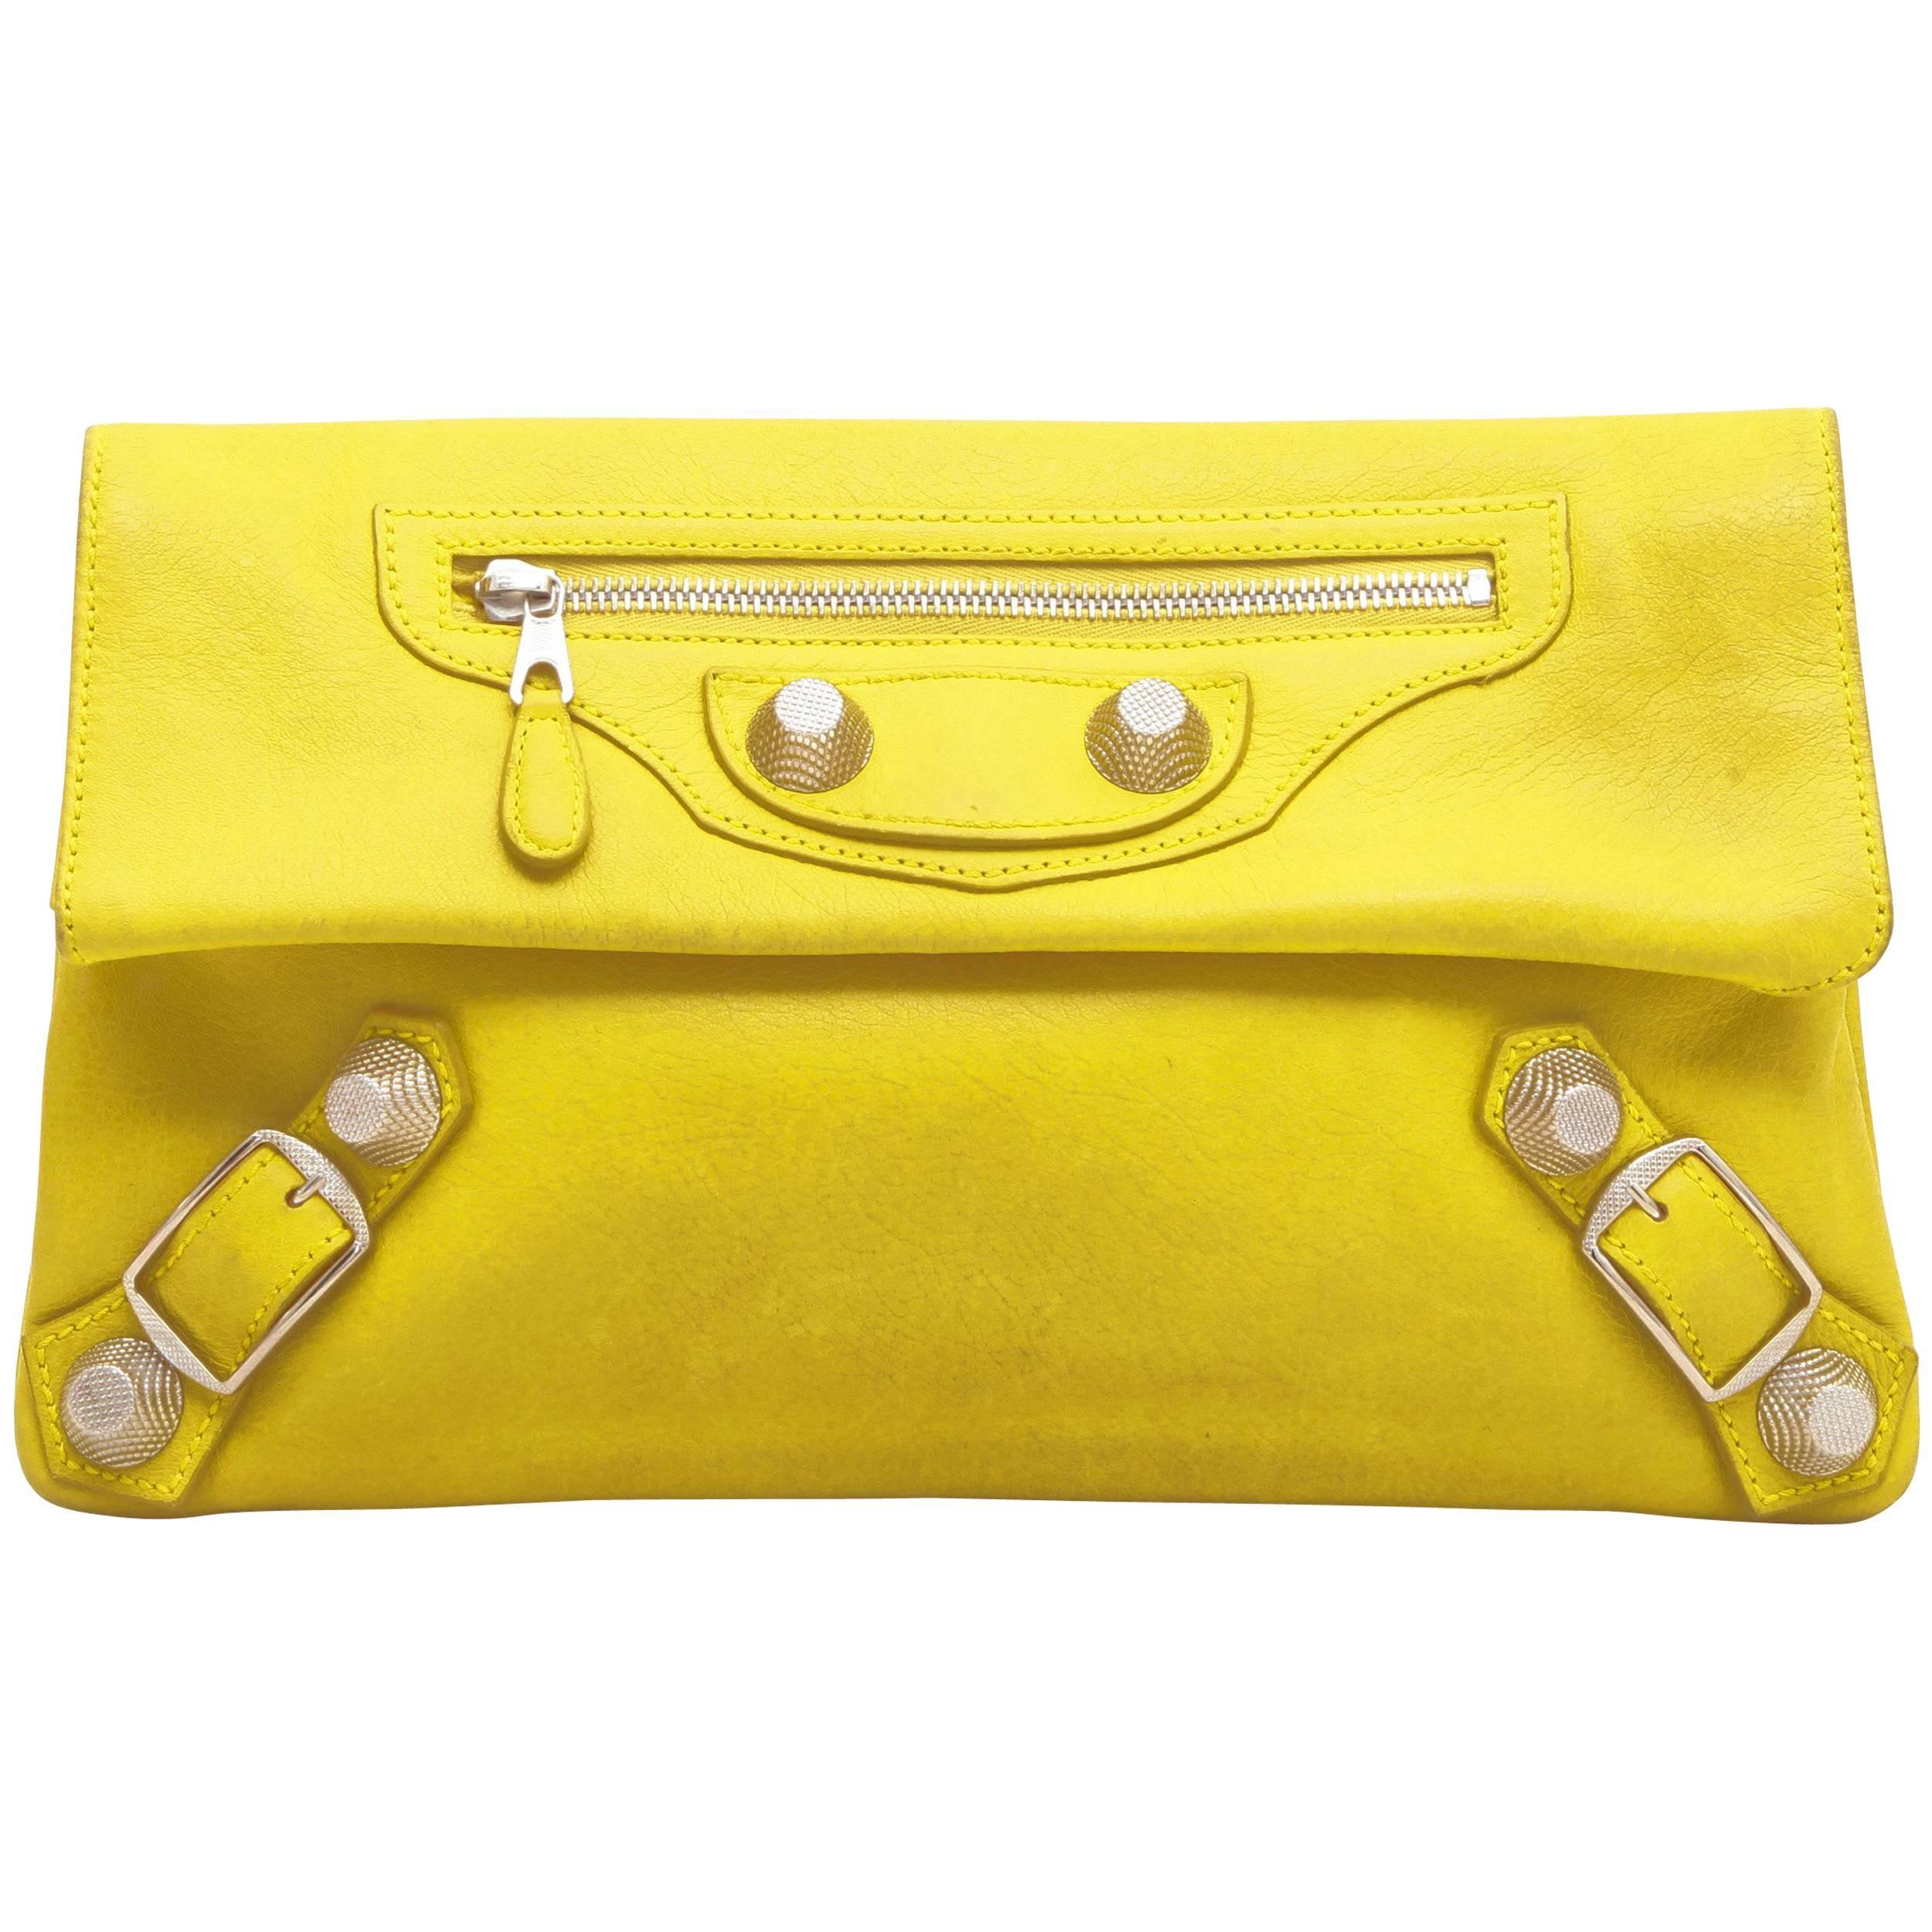 BALENCIAGA 'Giant Envelope' Clutch in Yellow Leather